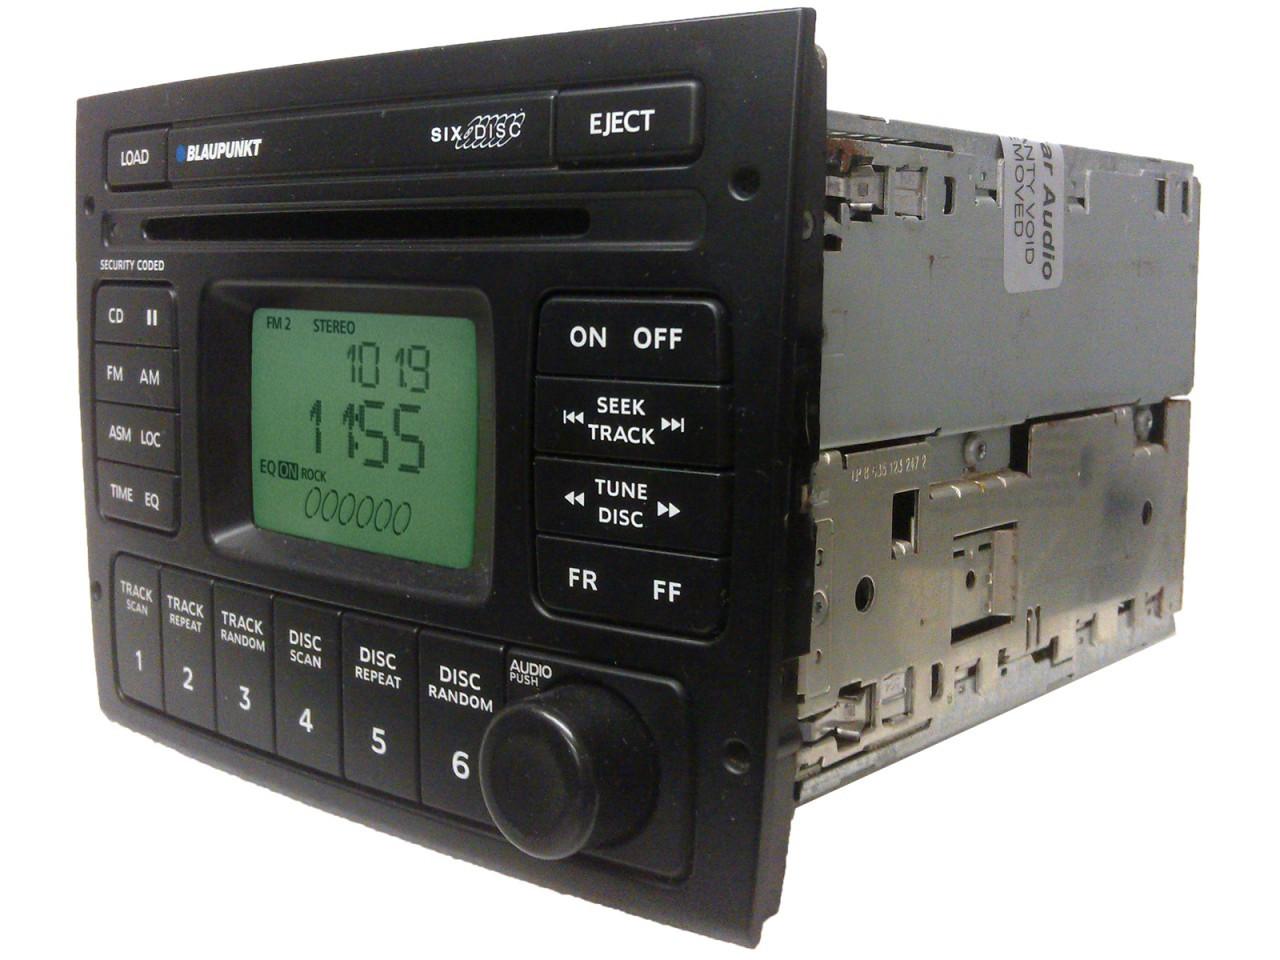 Pontiac BLAUPUNKT Radio 6 Disc CD Changer Stereo OEM